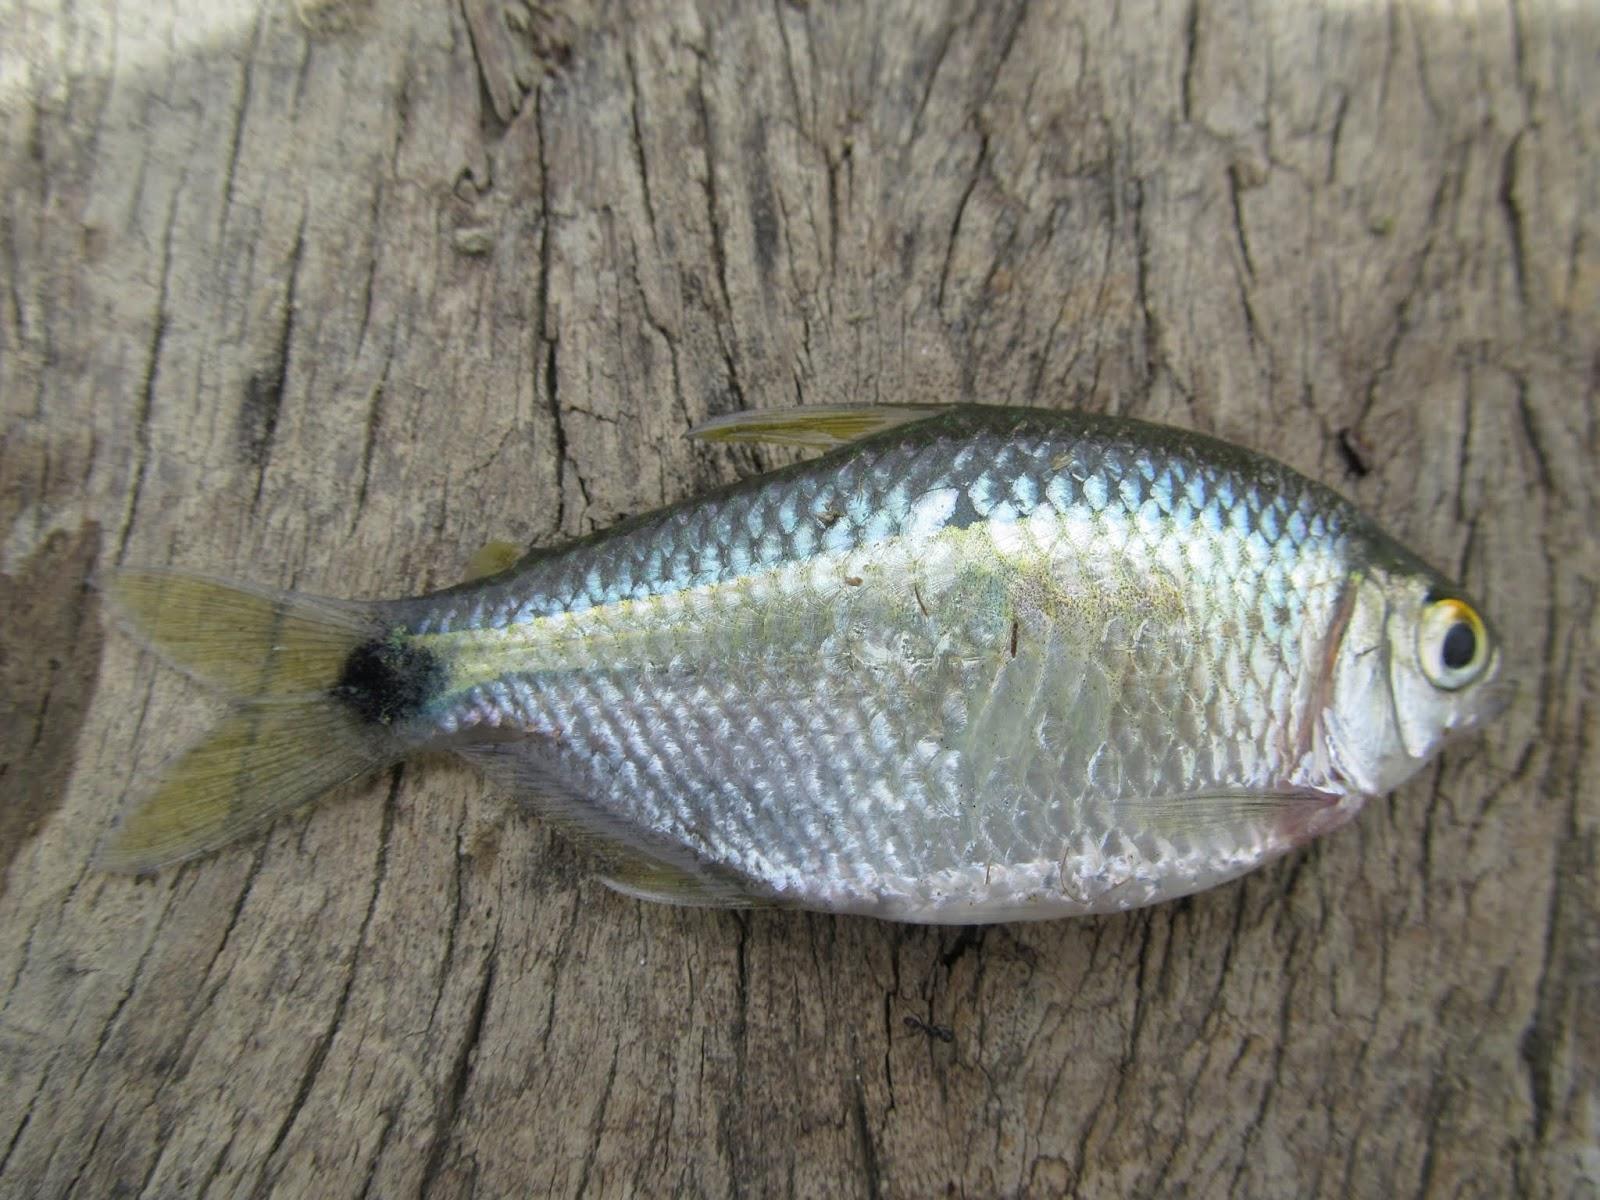 Fauna de colombia wildlife colombia peces for Pez cachama